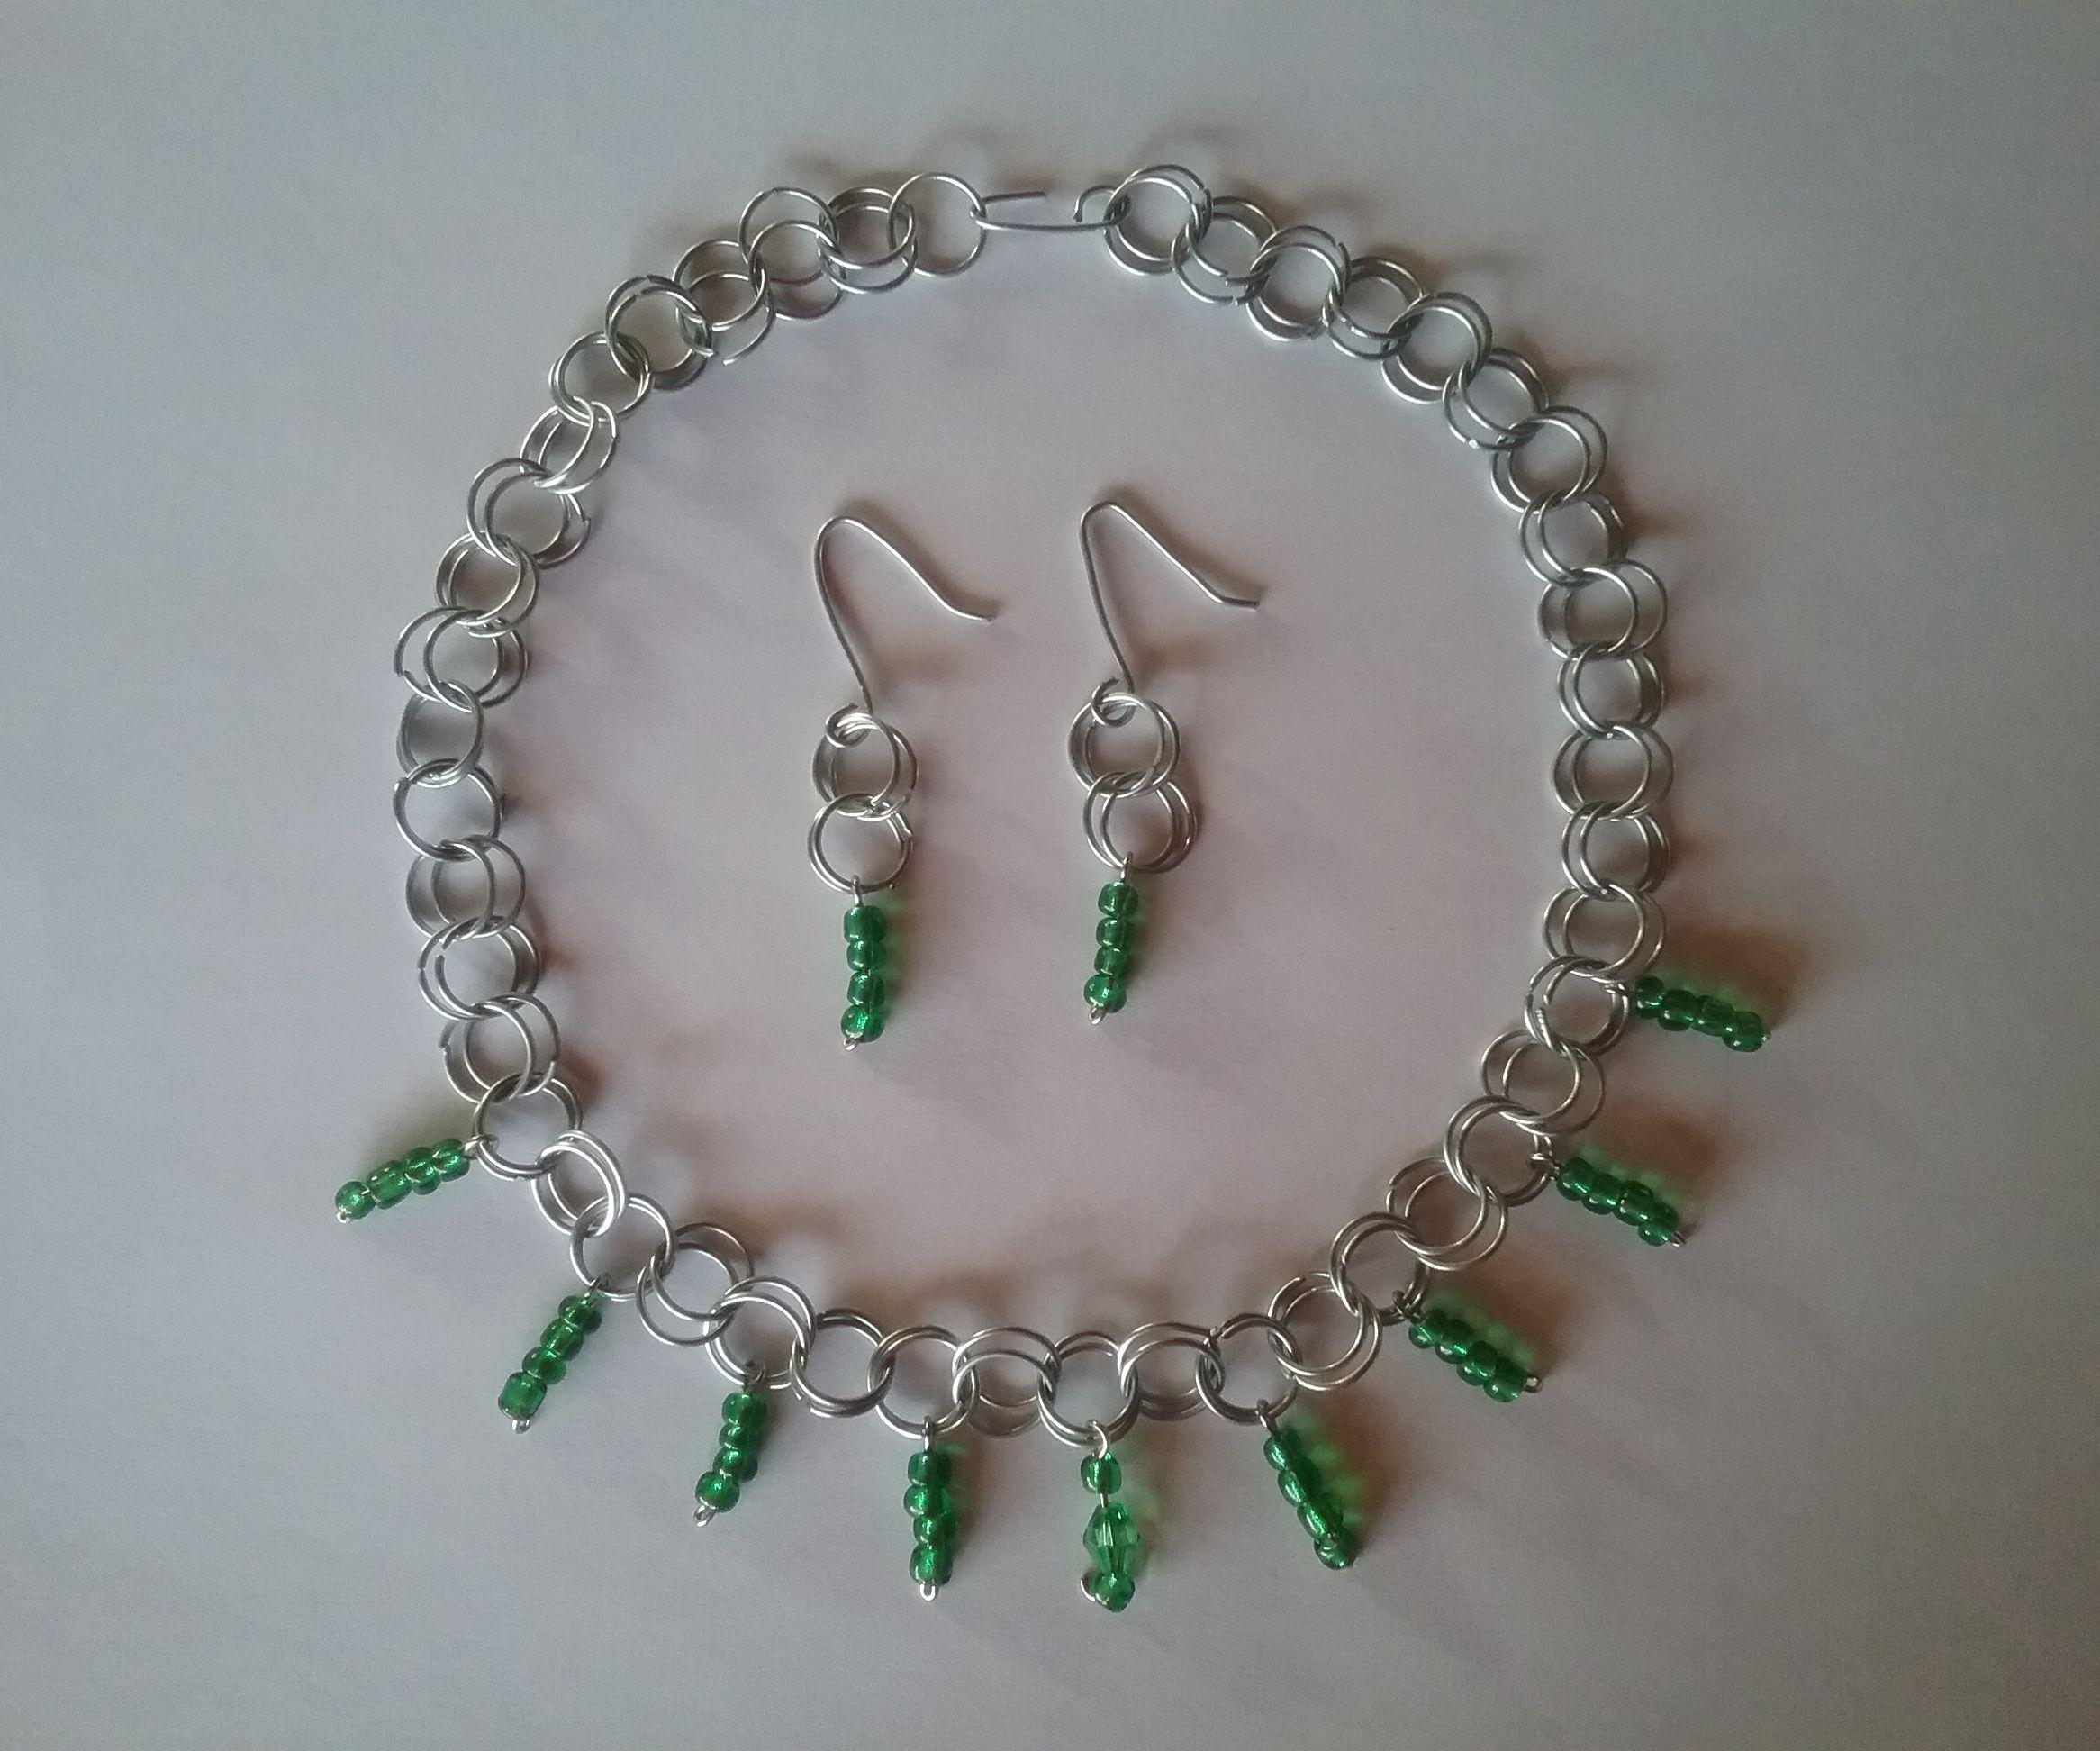 Emerald Chainmail Choker and Earrings